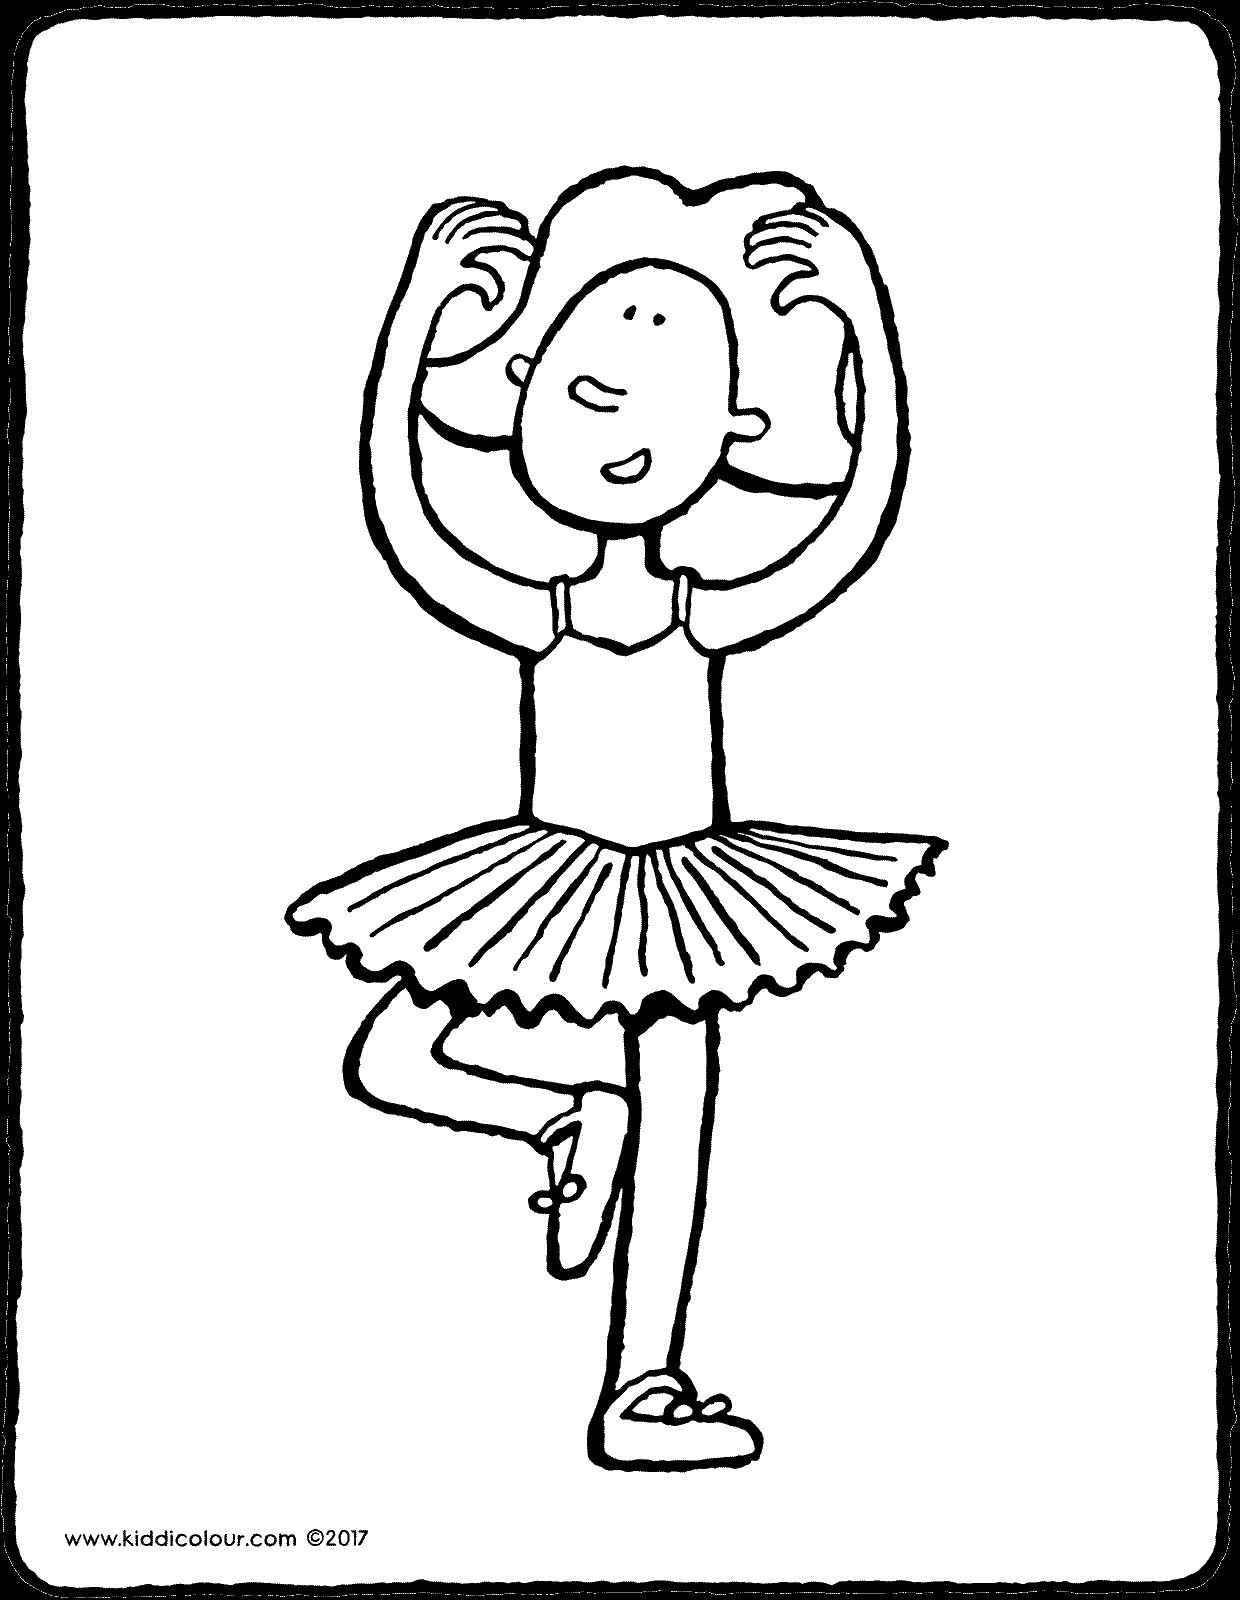 ausmalbilder unimog neu ballerina zum ausmalen einzigartig